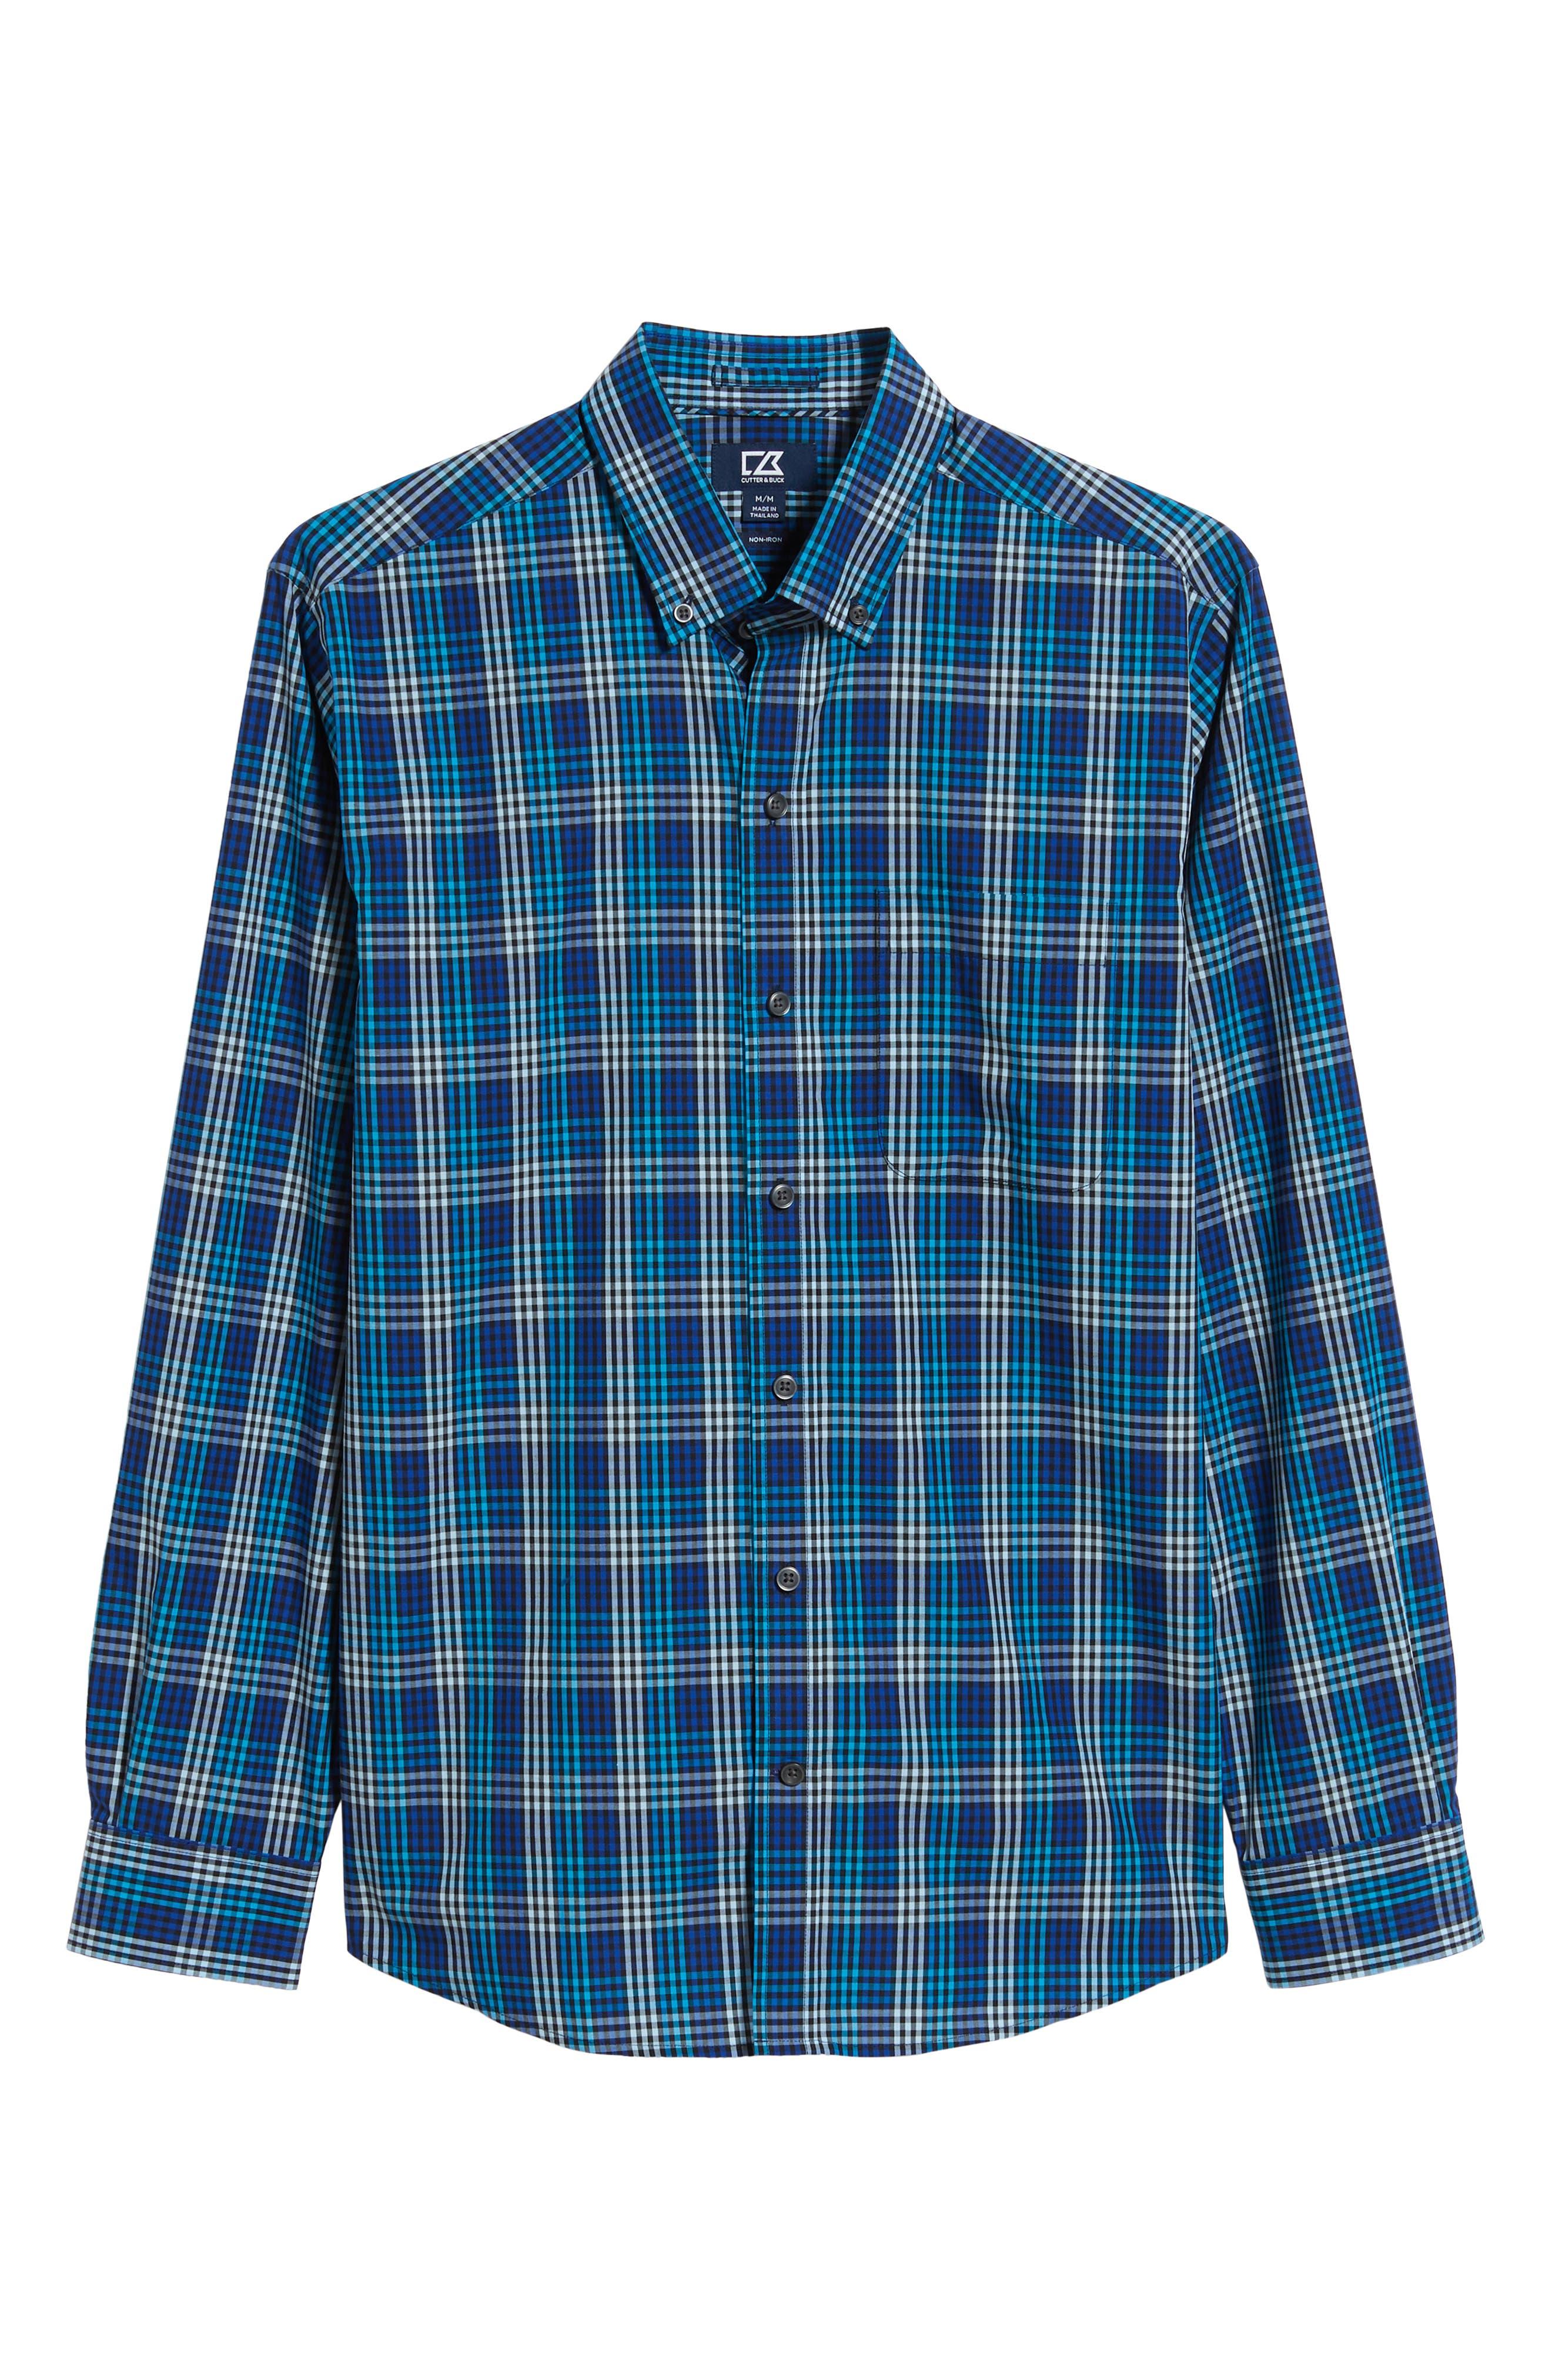 Regular Fit Non-Iron Sport Shirt,                             Alternate thumbnail 5, color,                             ORBIT